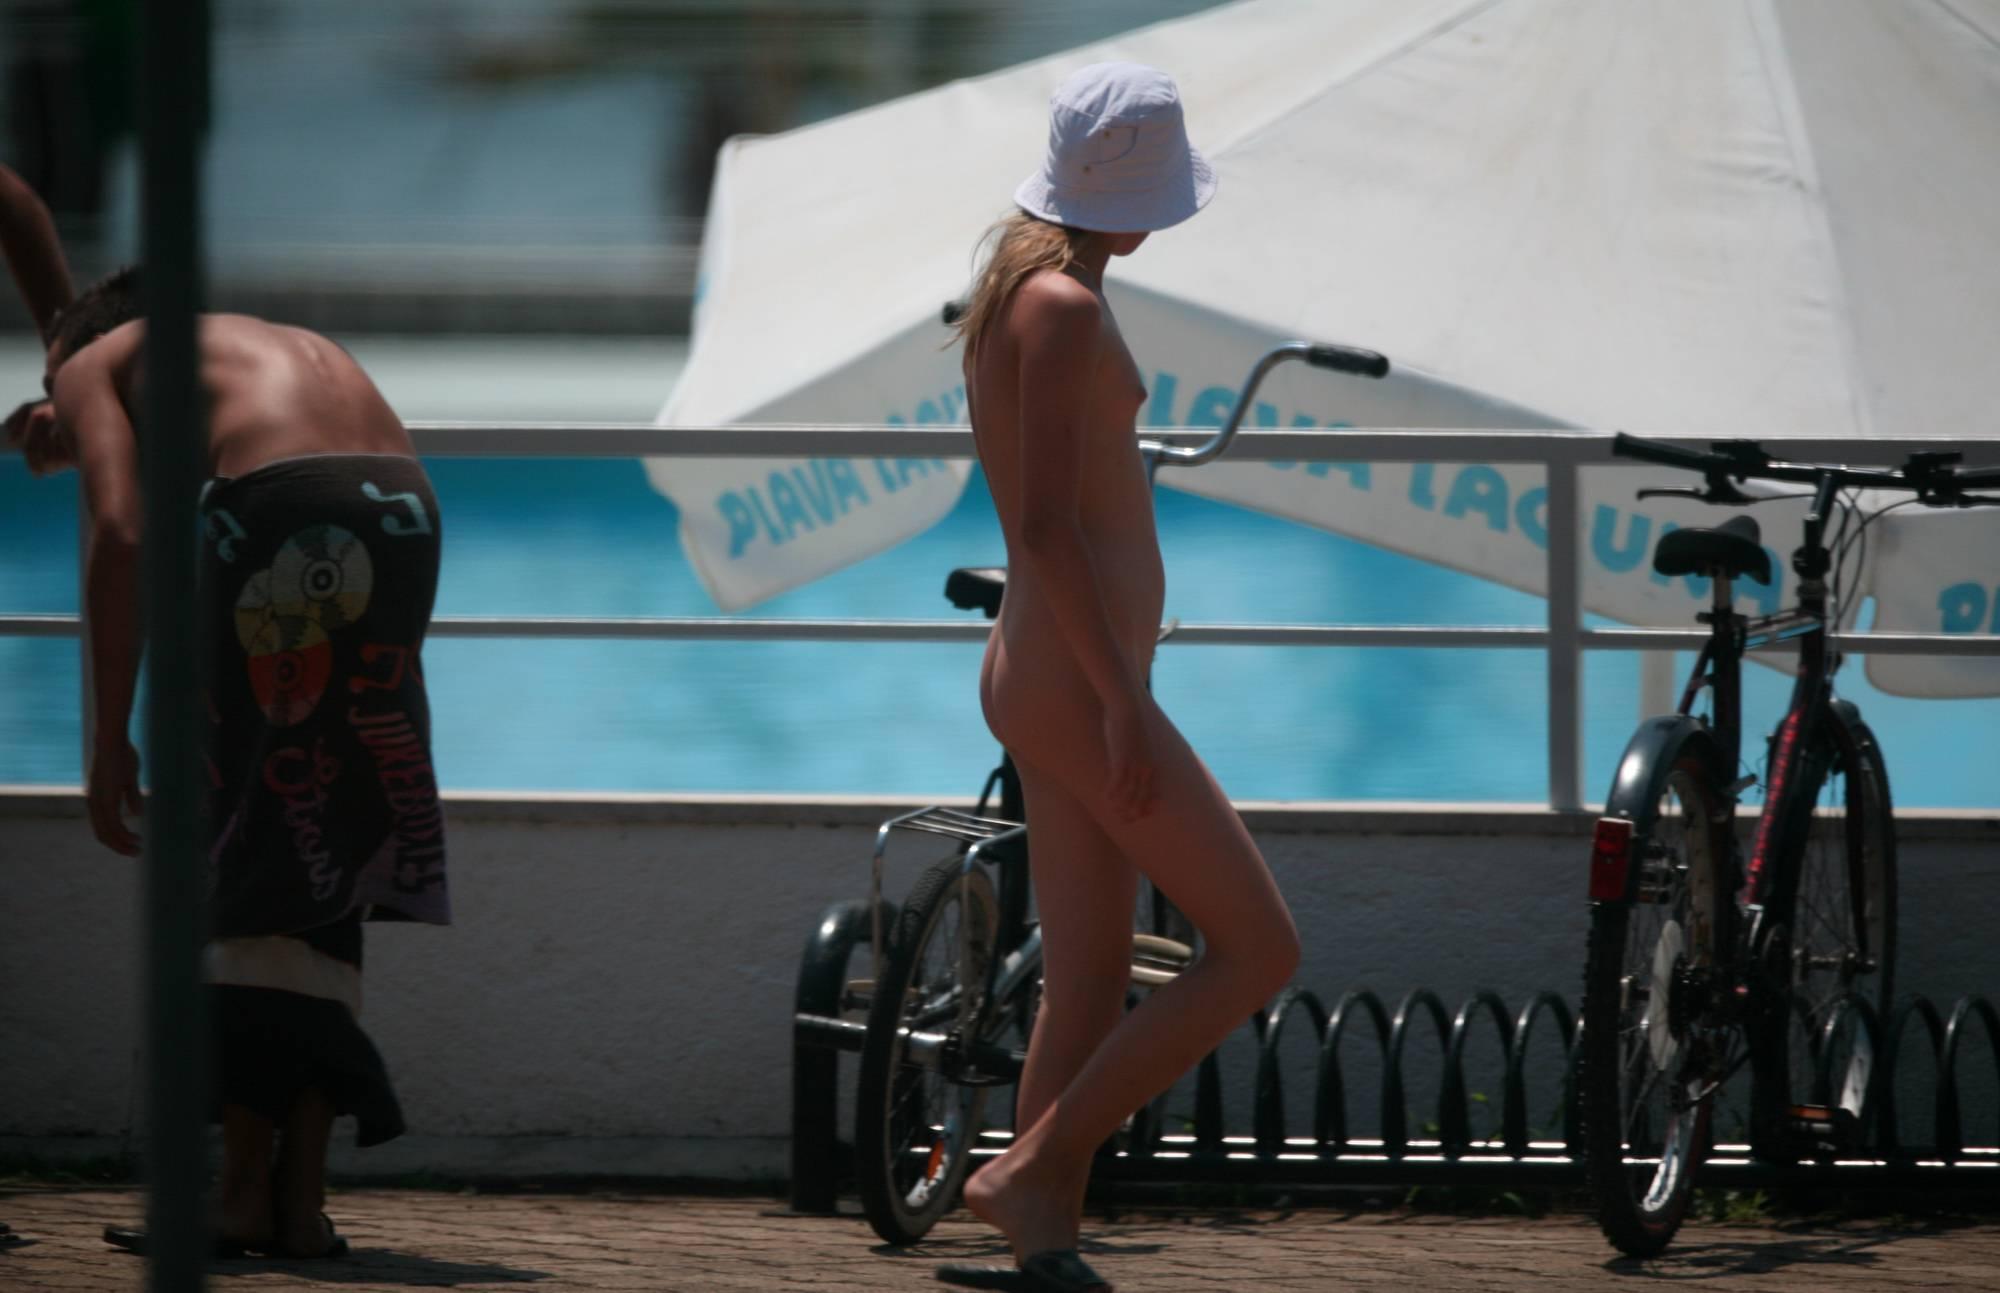 Pure Nudism Pics-European Exit Passer Bys - 1